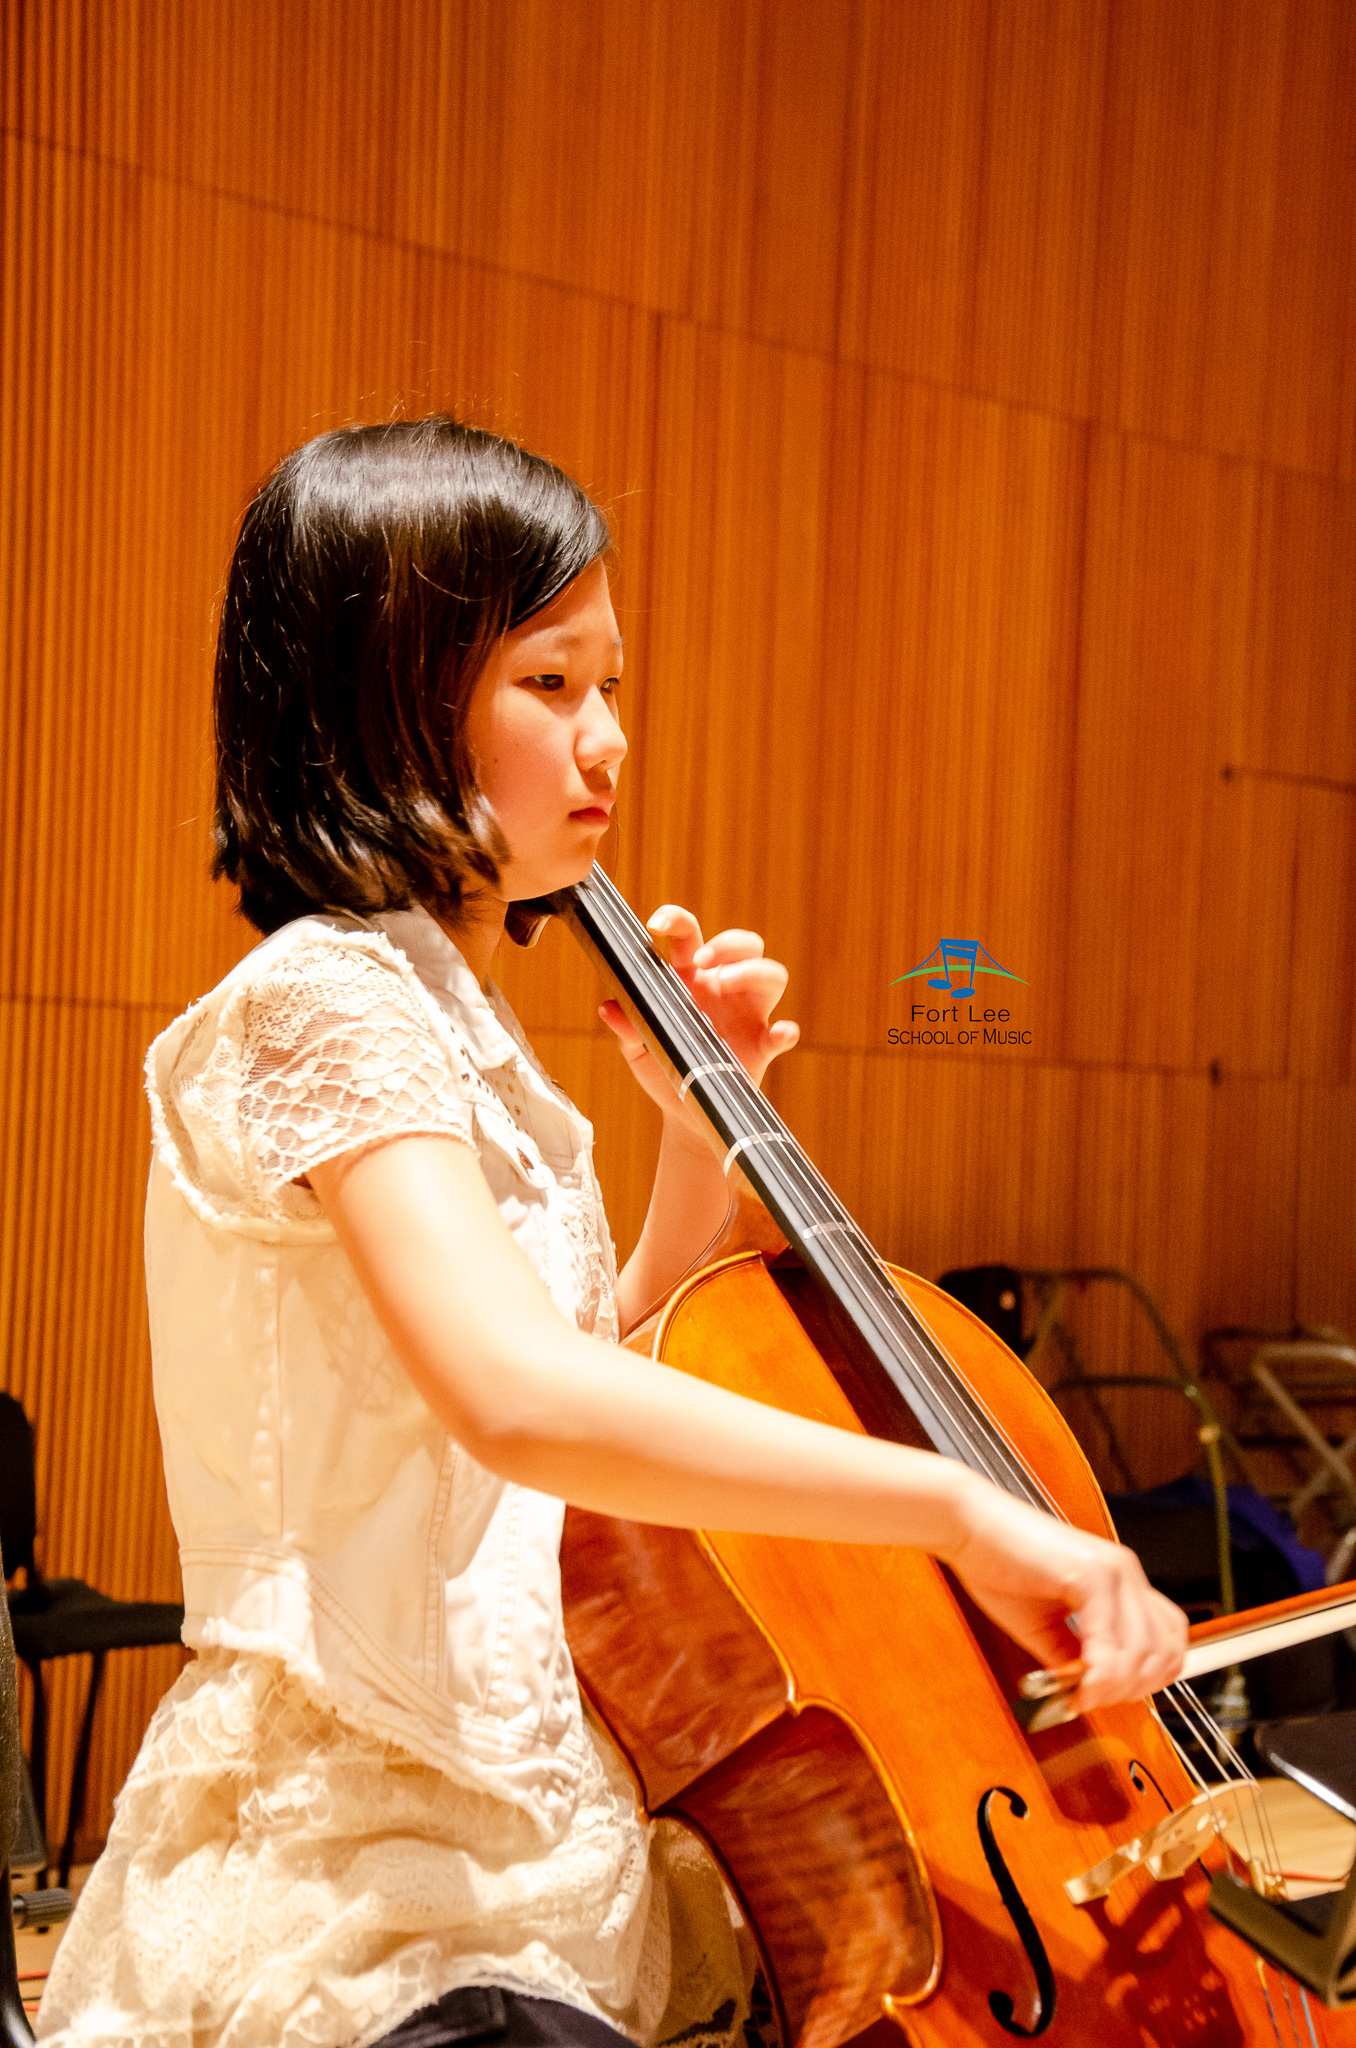 cello-lessons-bergen-county.jpg